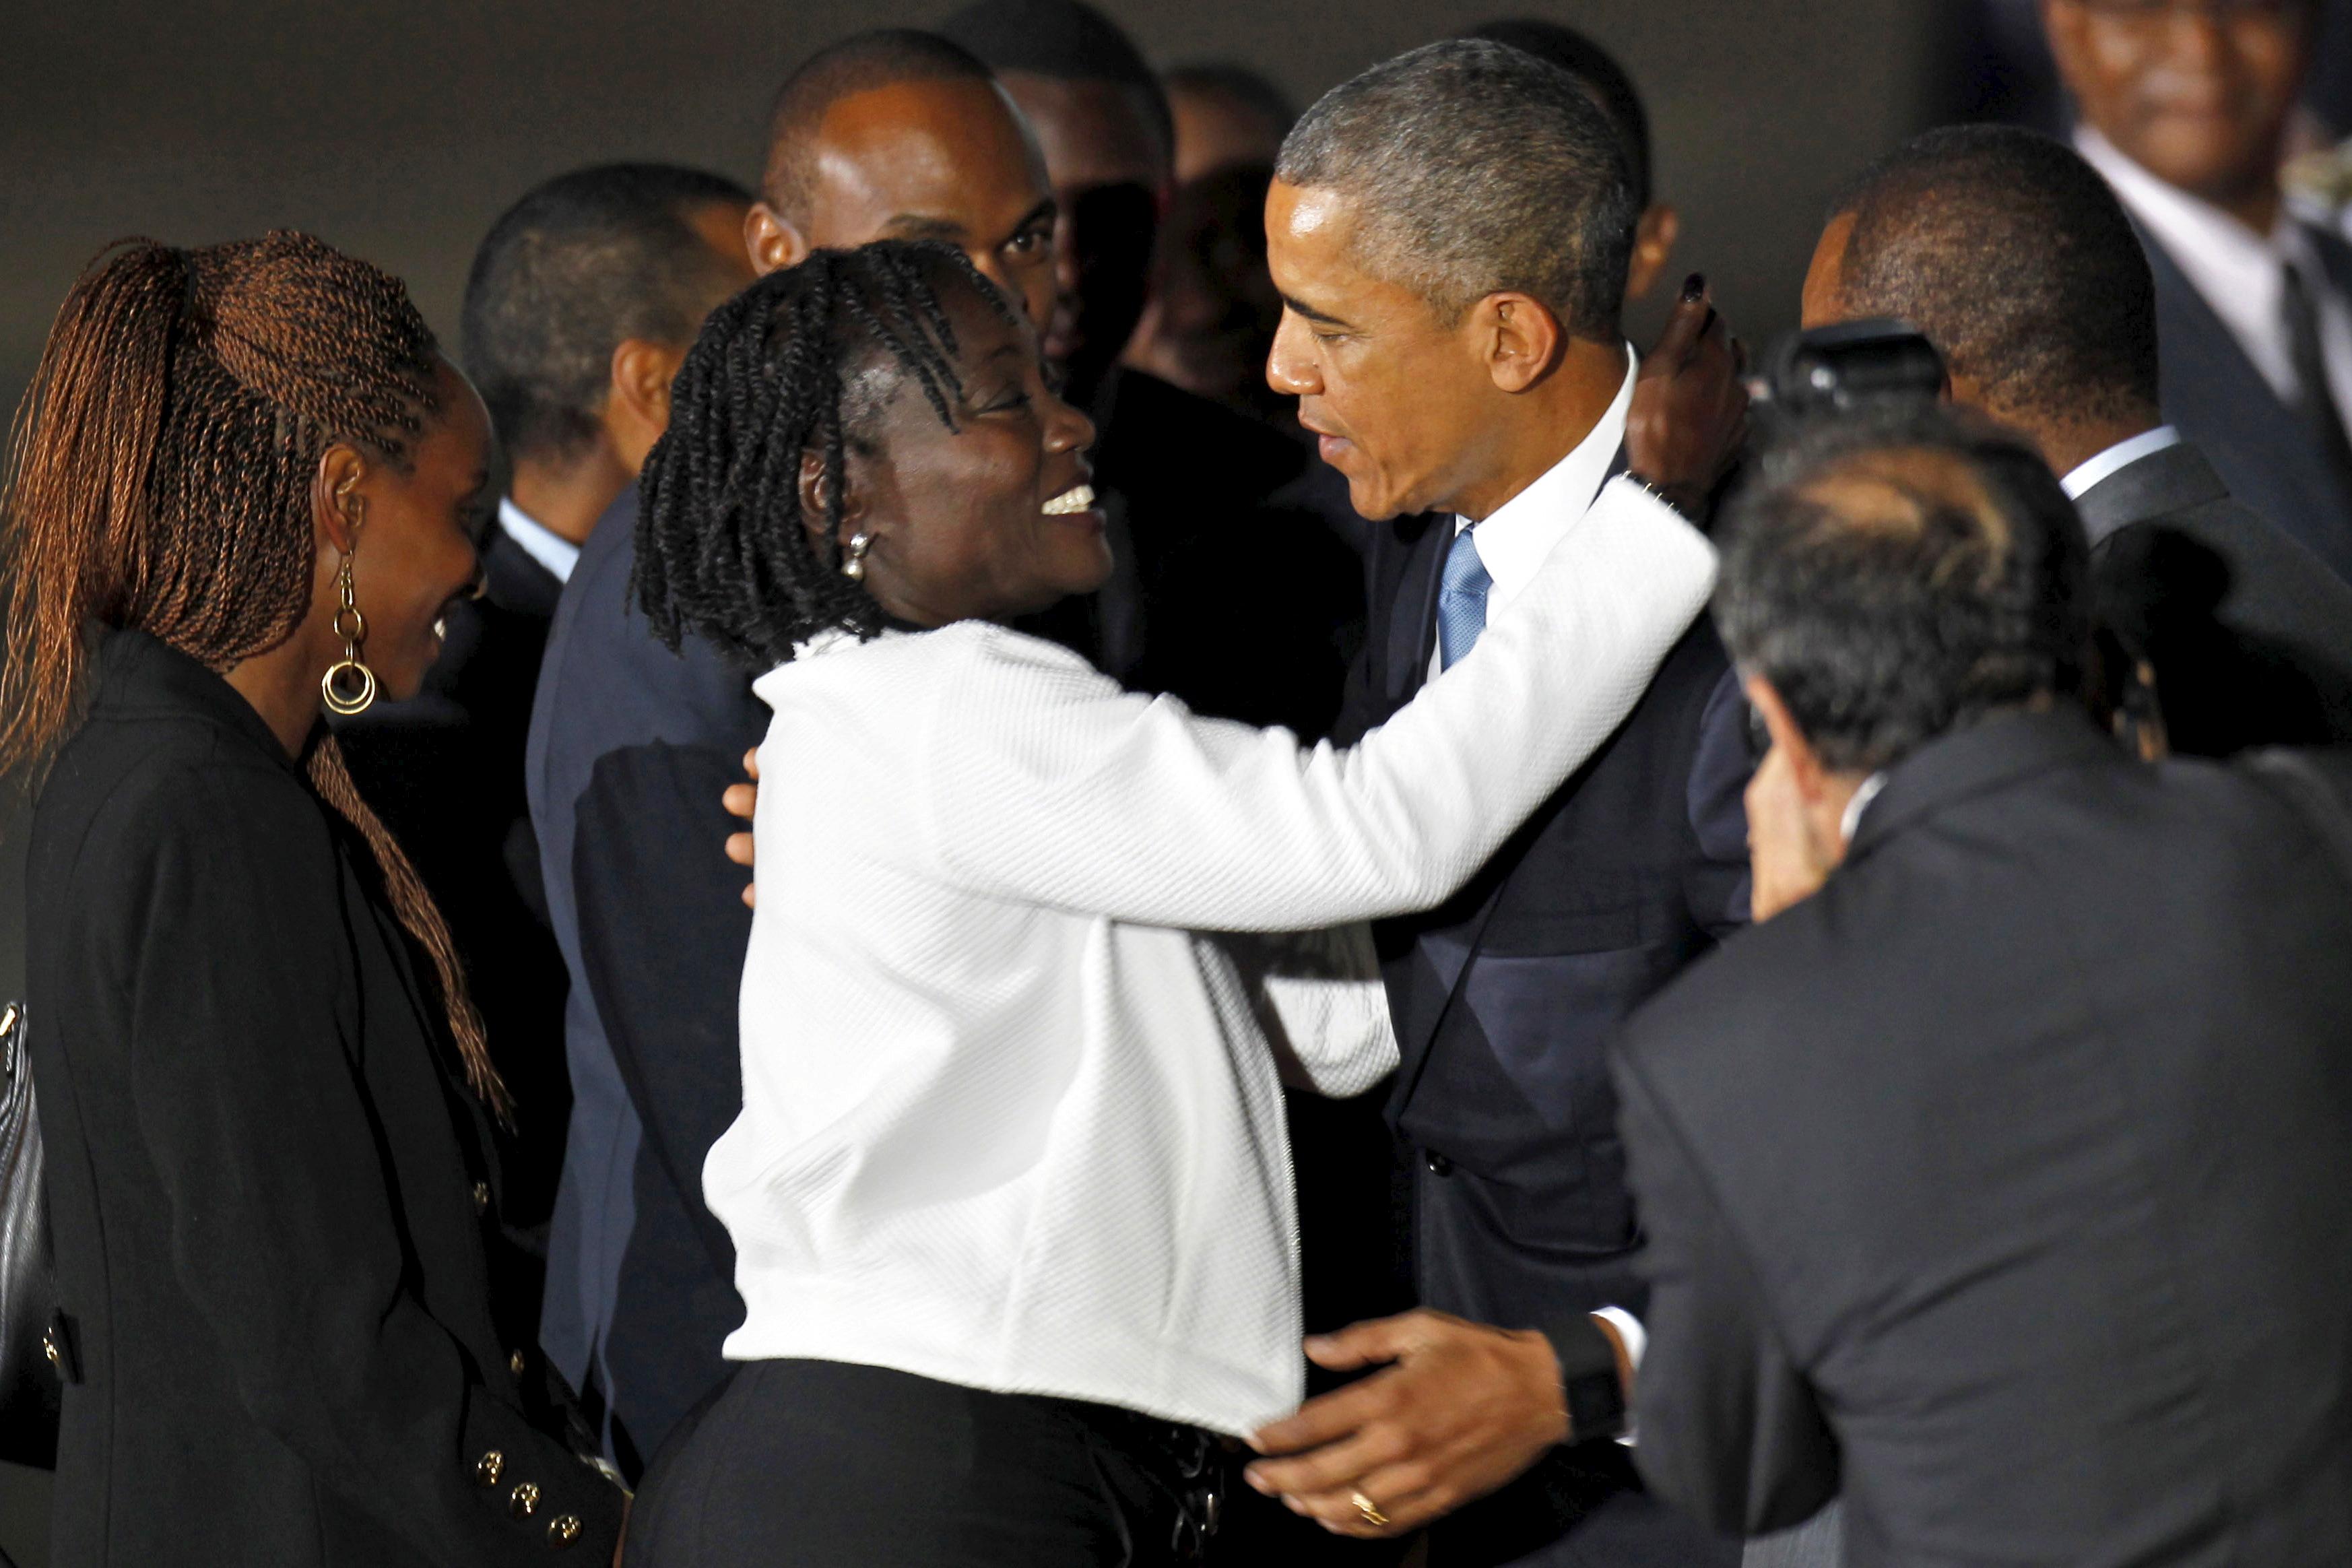 U.S. President Barack Obama embraces his half-sister Auma Obama as he arrives aboard Air Force One at Jomo Kenyatta International Airport in Nairobi